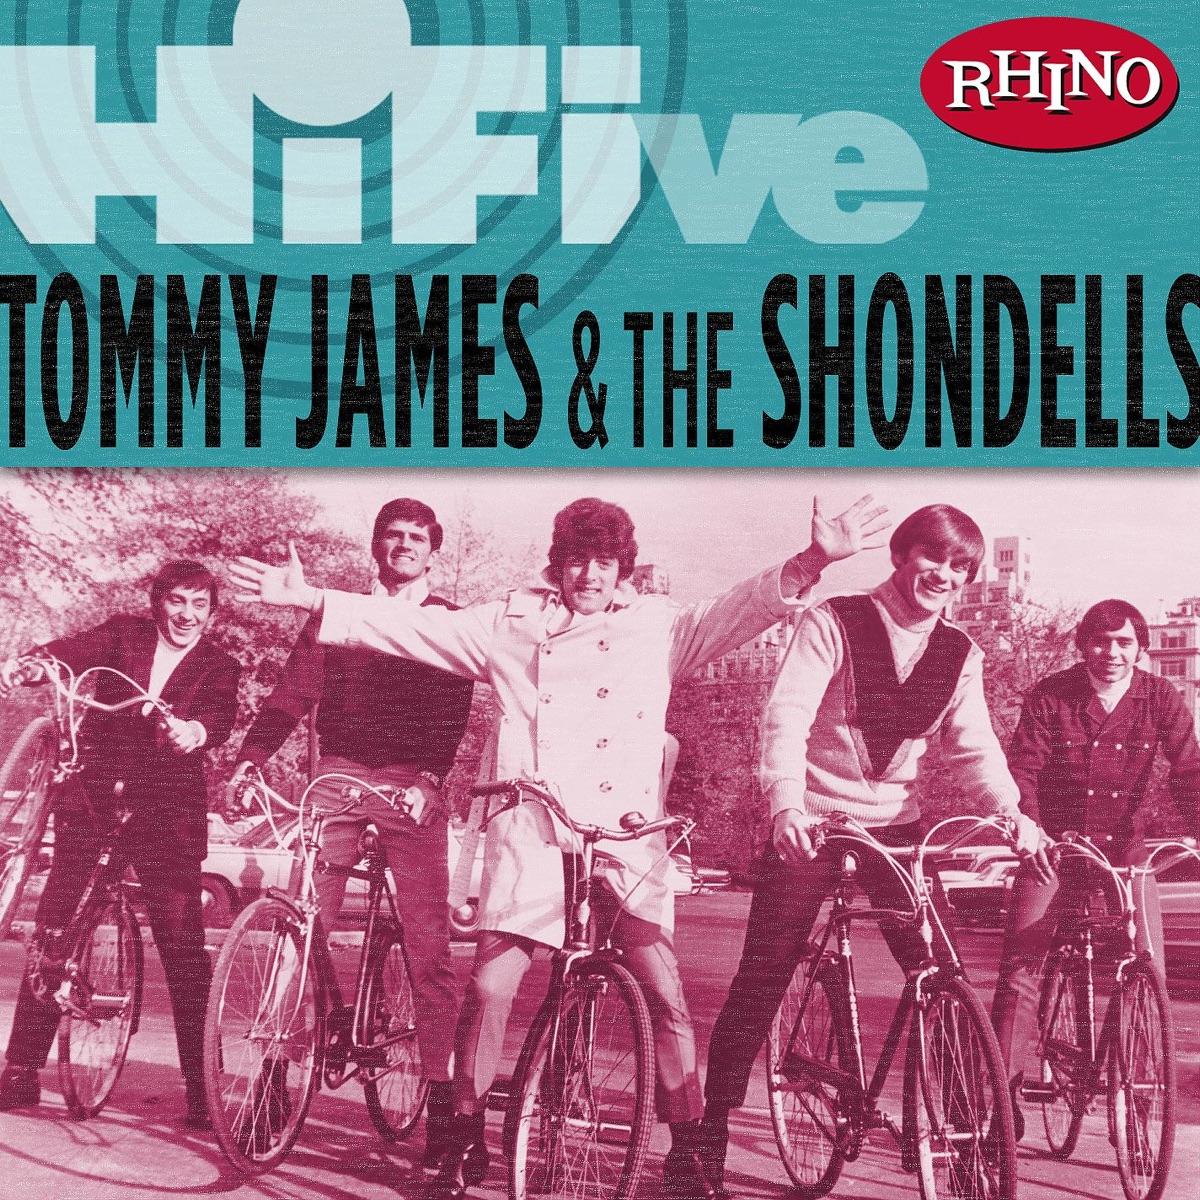 Rhino Hi-Five Tommy James  the Shondells - EP Tommy James  The Shondells CD cover